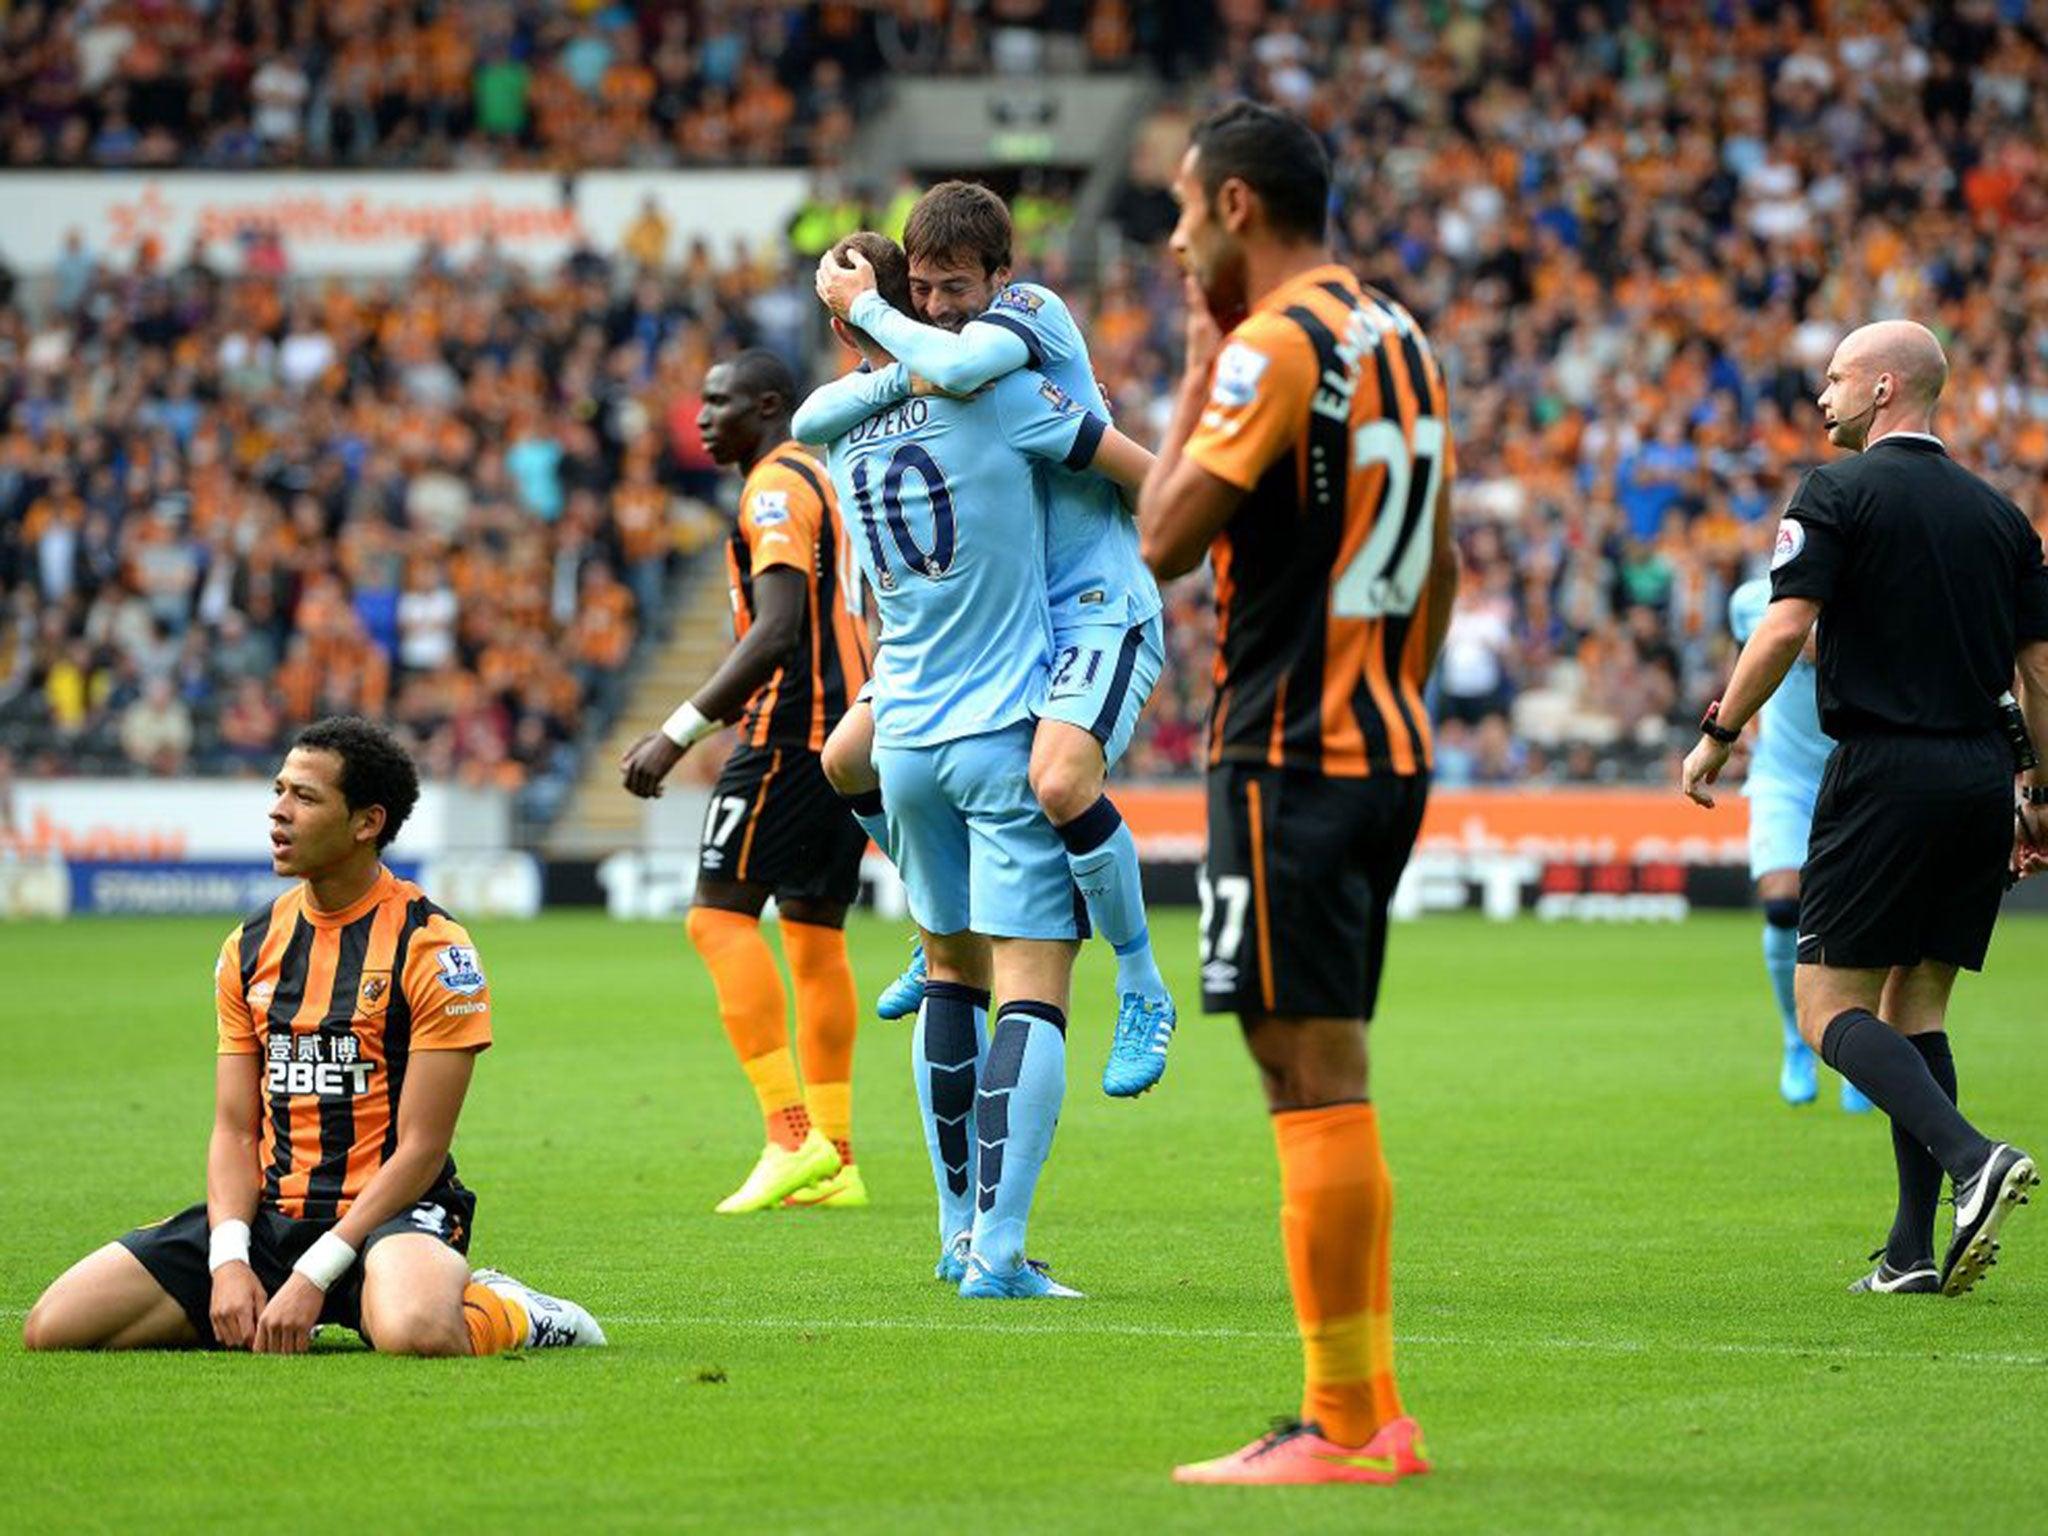 Hull City vs Manchester City match report Edin Dzeko double earns